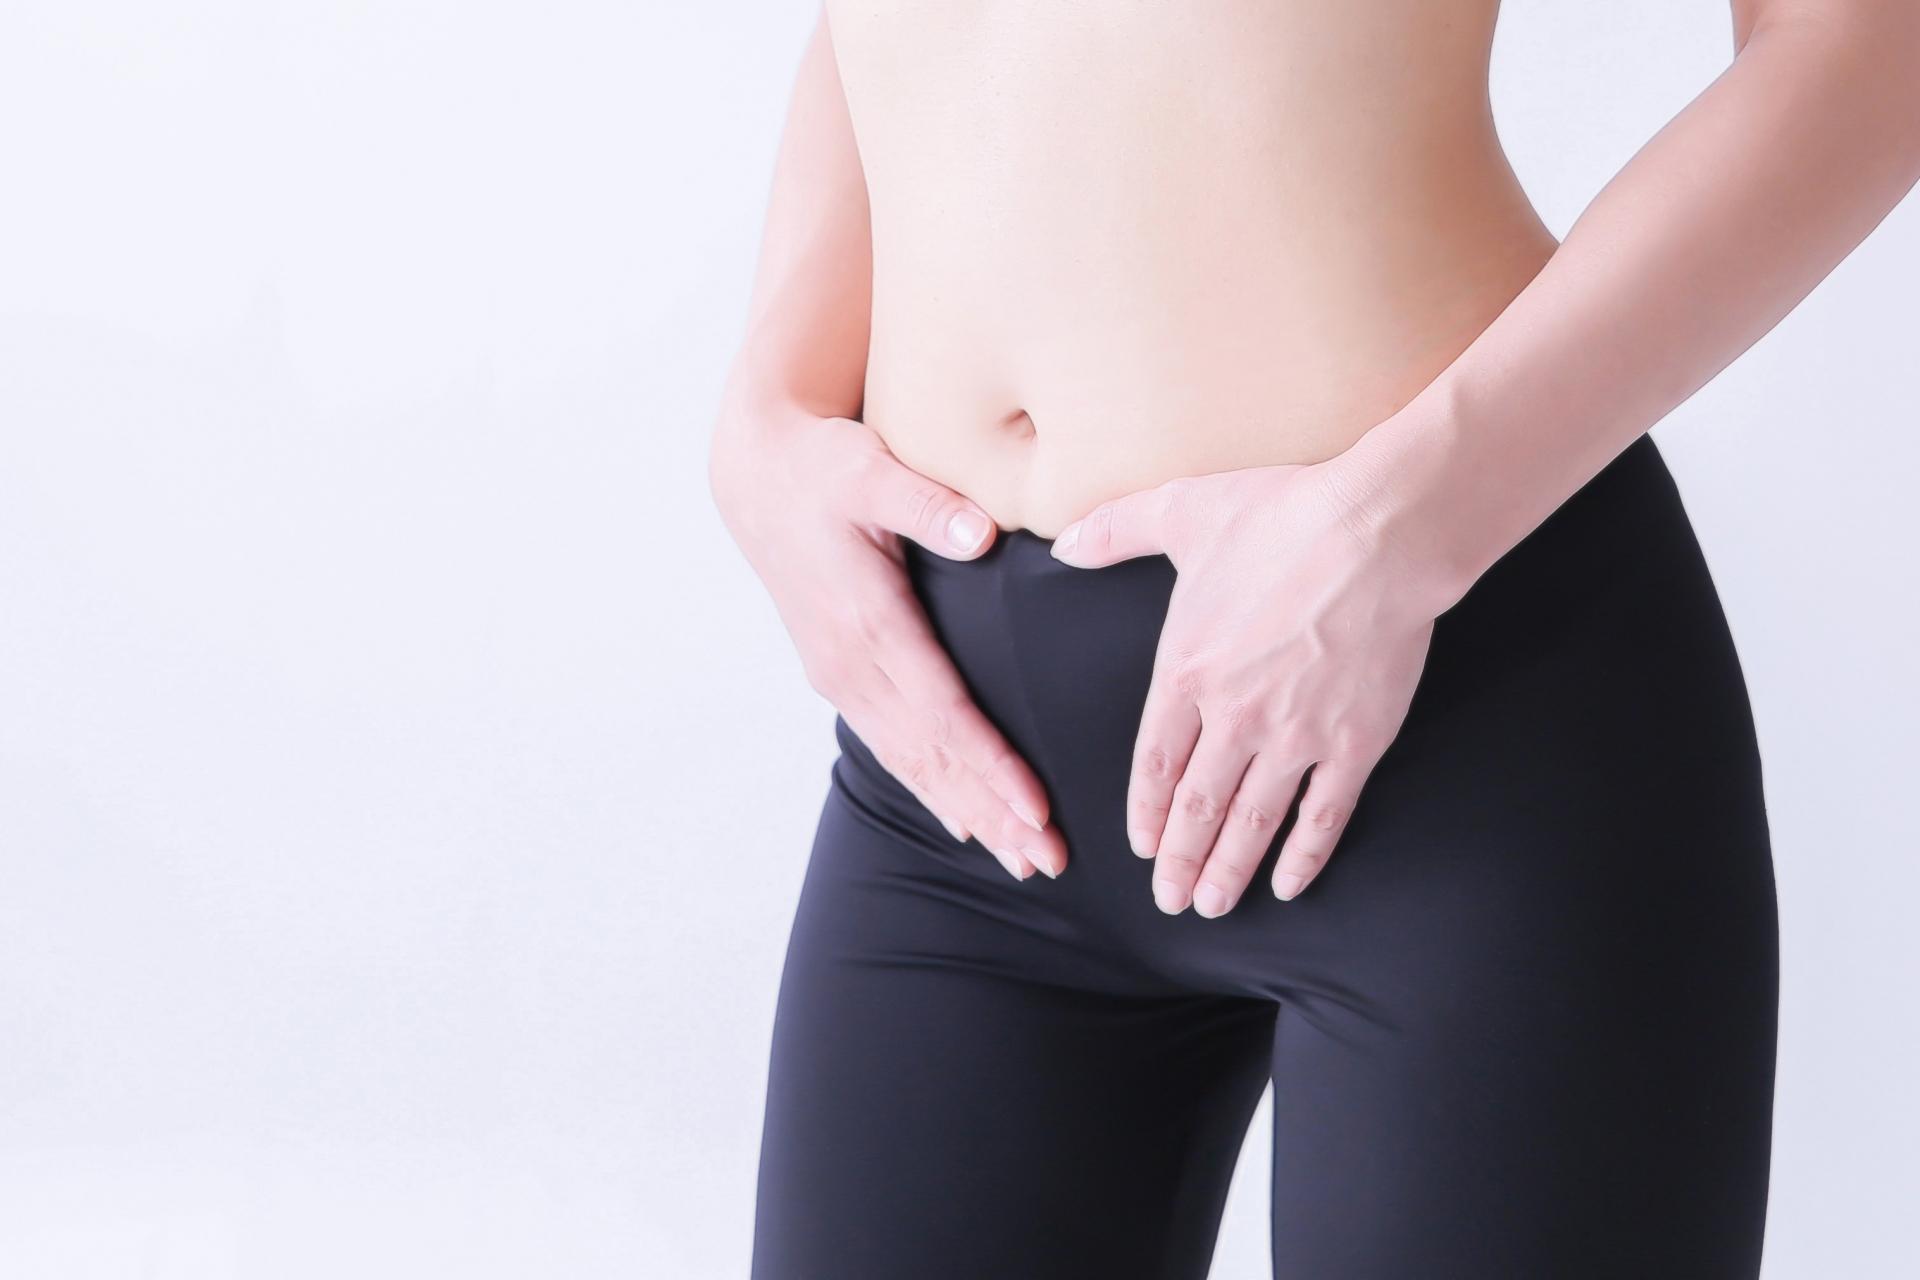 産後の女性骨盤